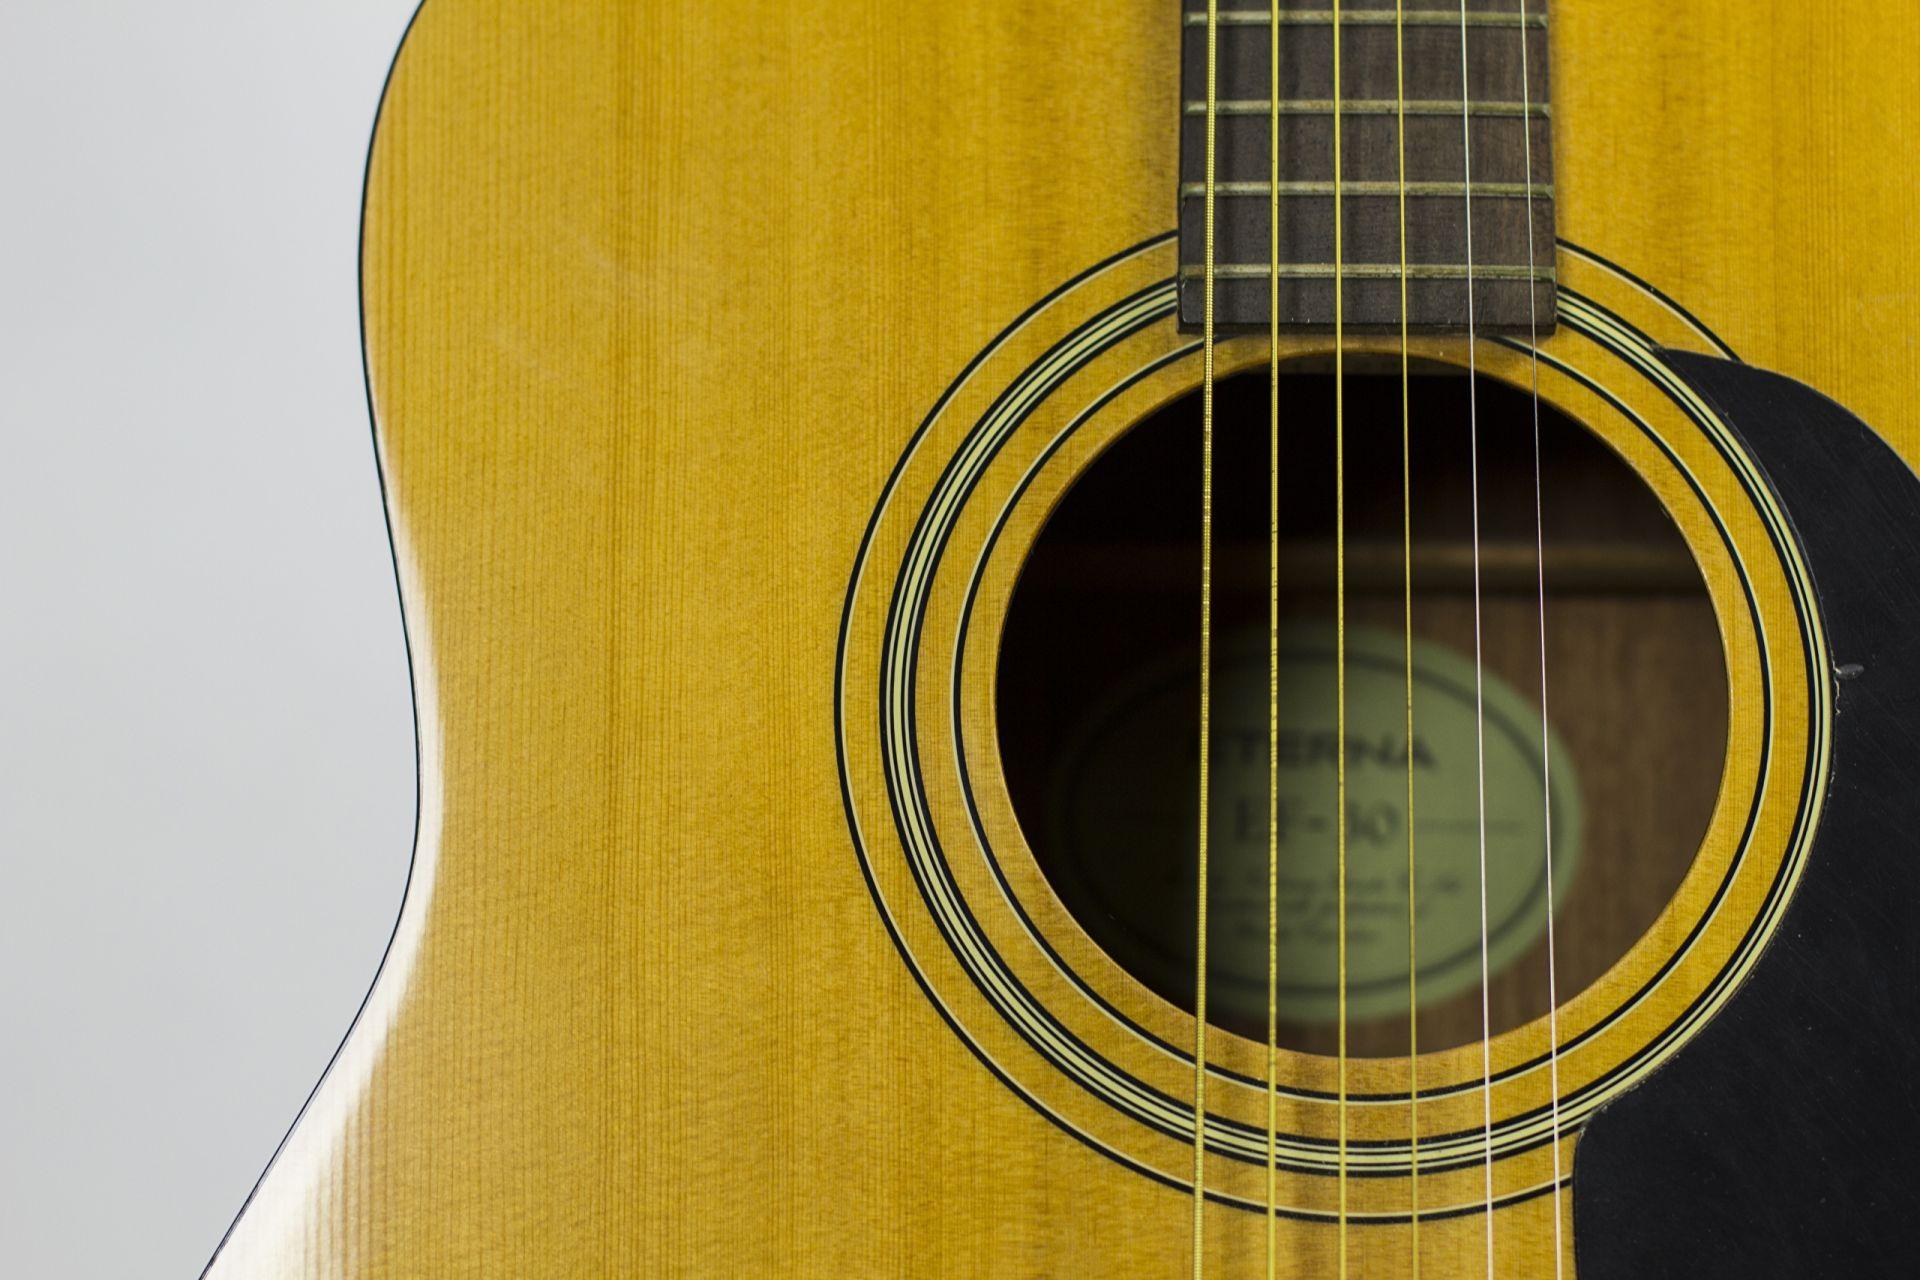 Acoustic Guitar, Cool HD Wallpaper